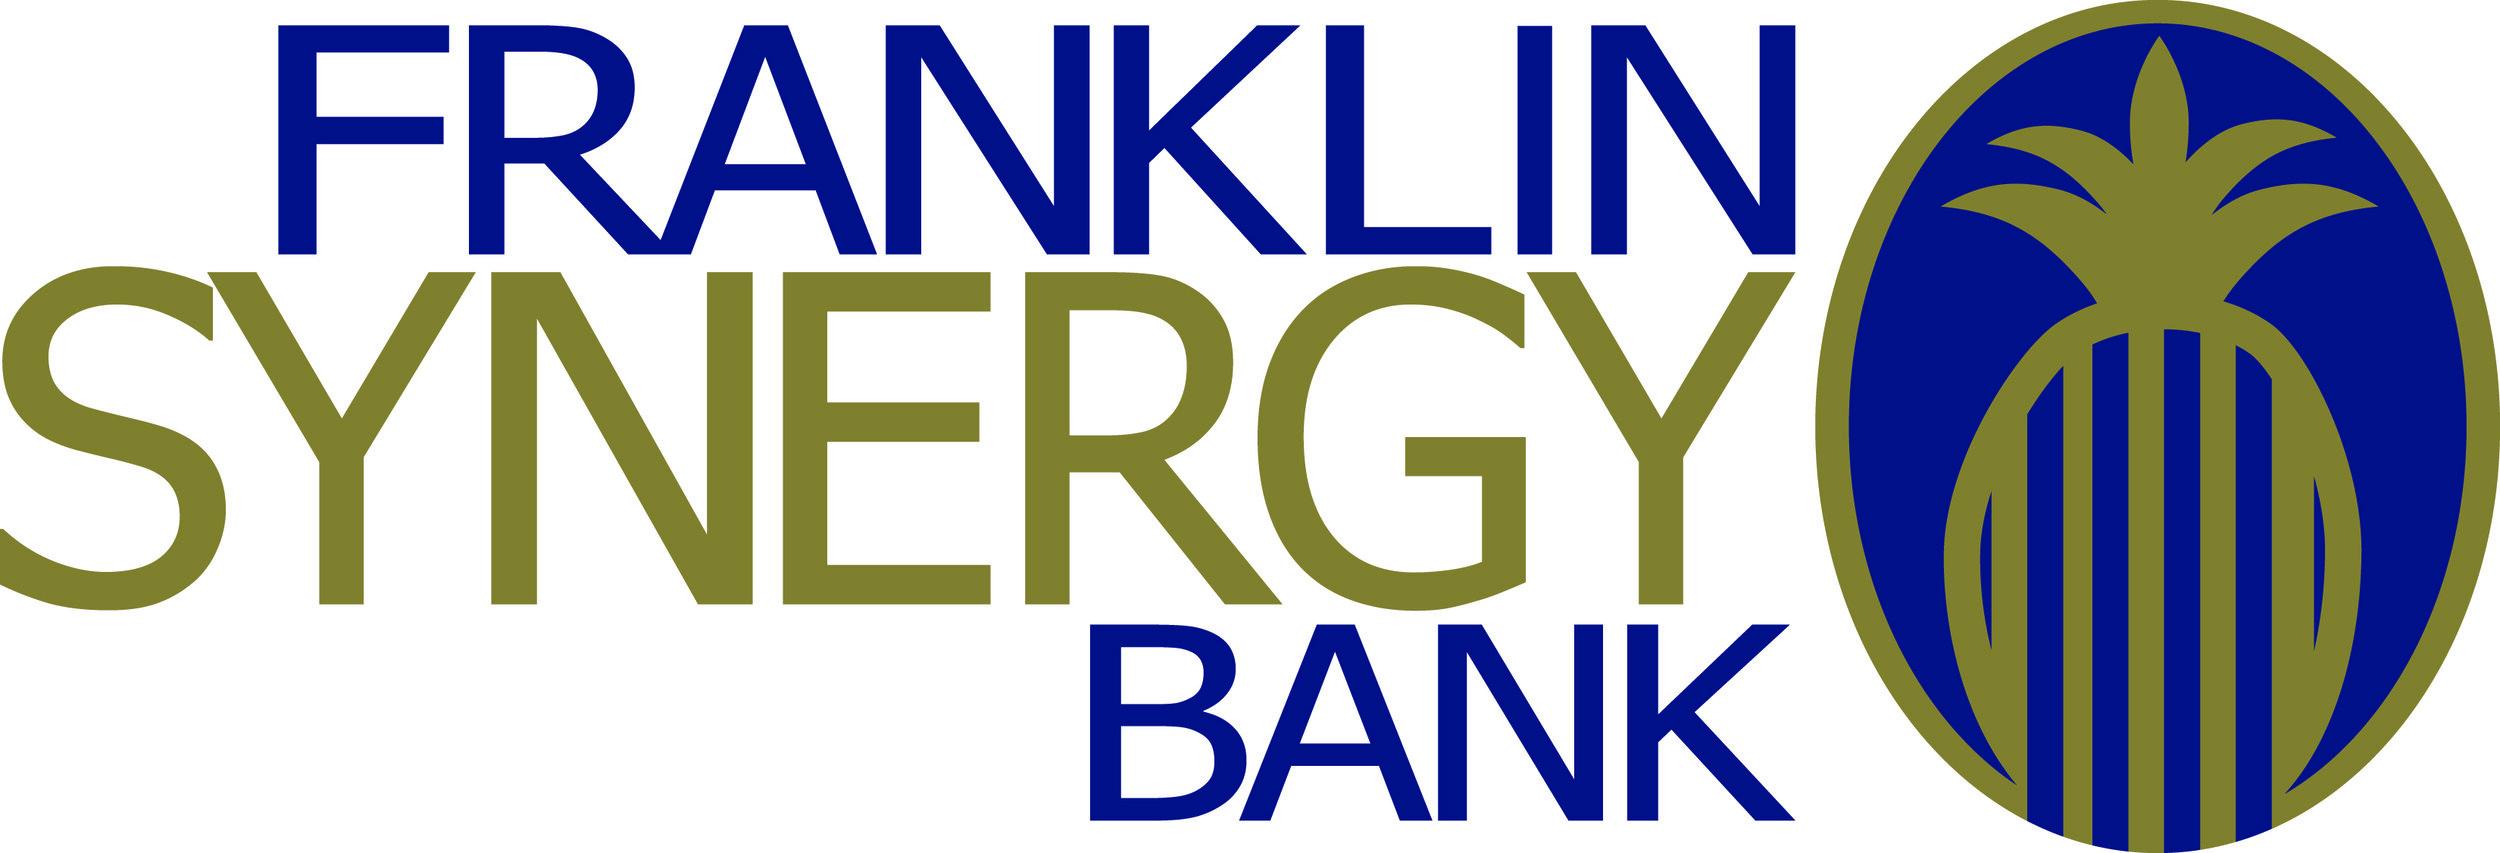 Franklin Synergy Bank Master Logo.jpg